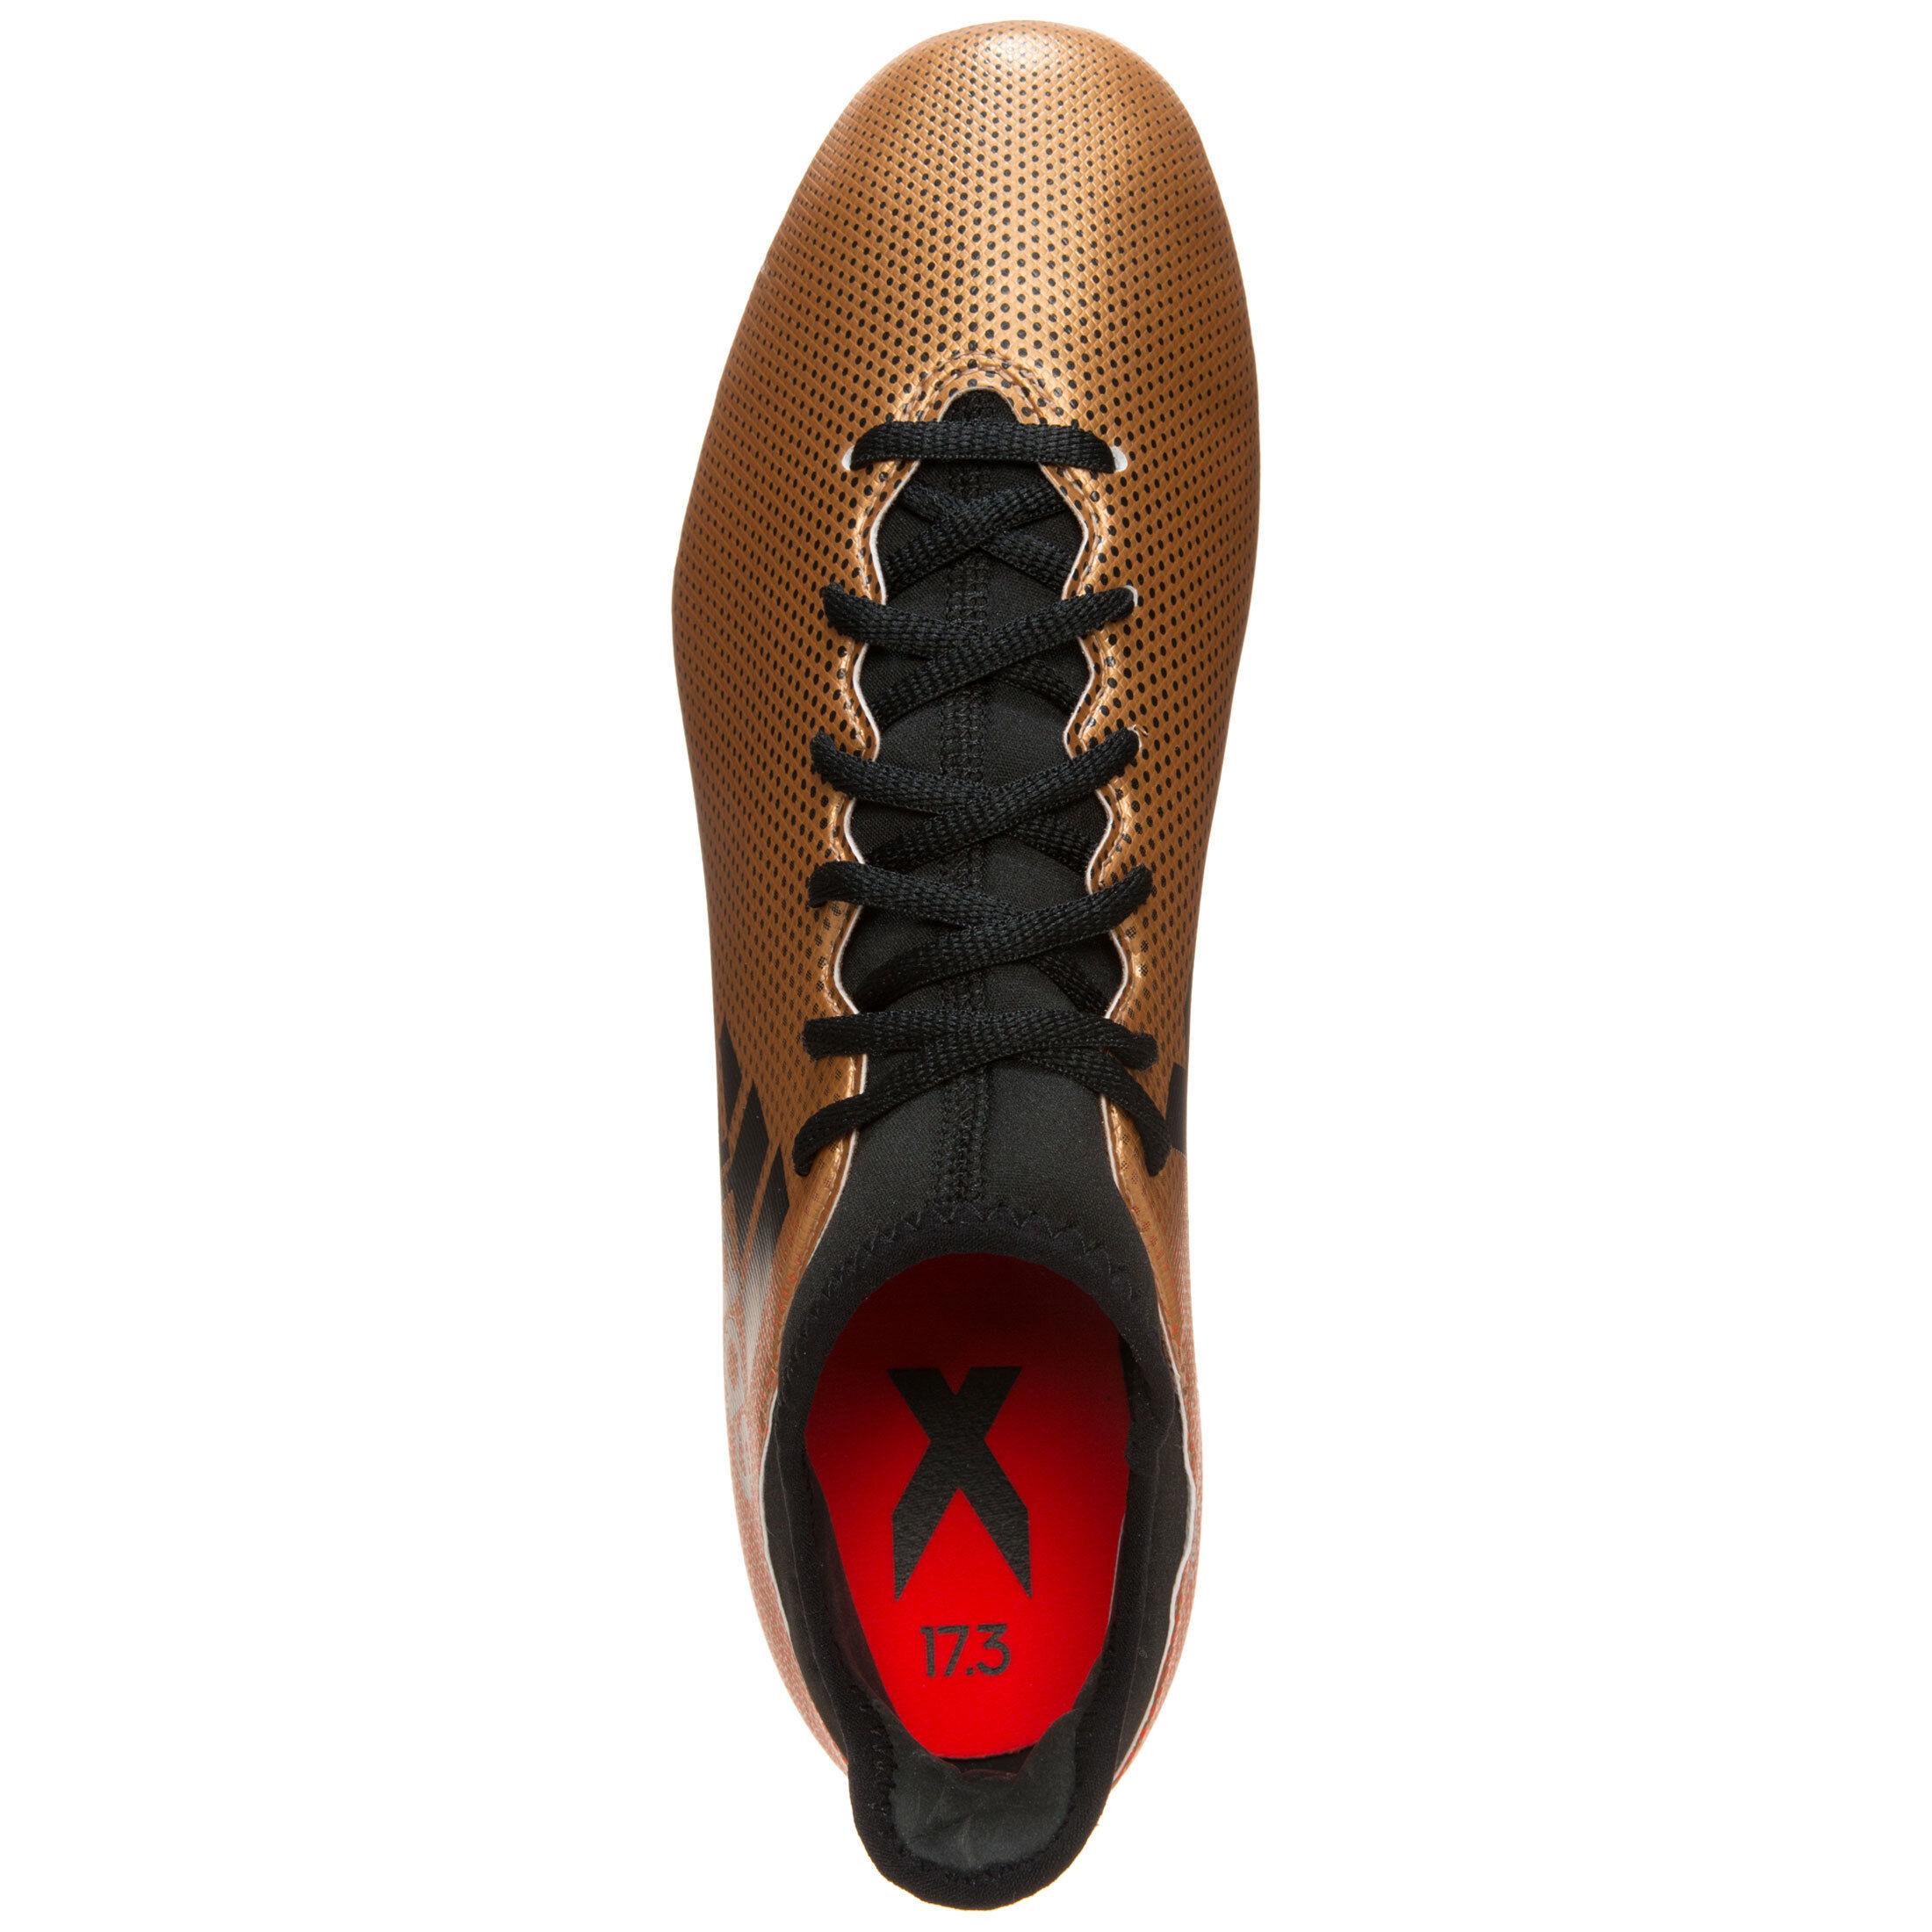 Herren Fußballschuhe adidas X 17.3 FG Gold Metallic